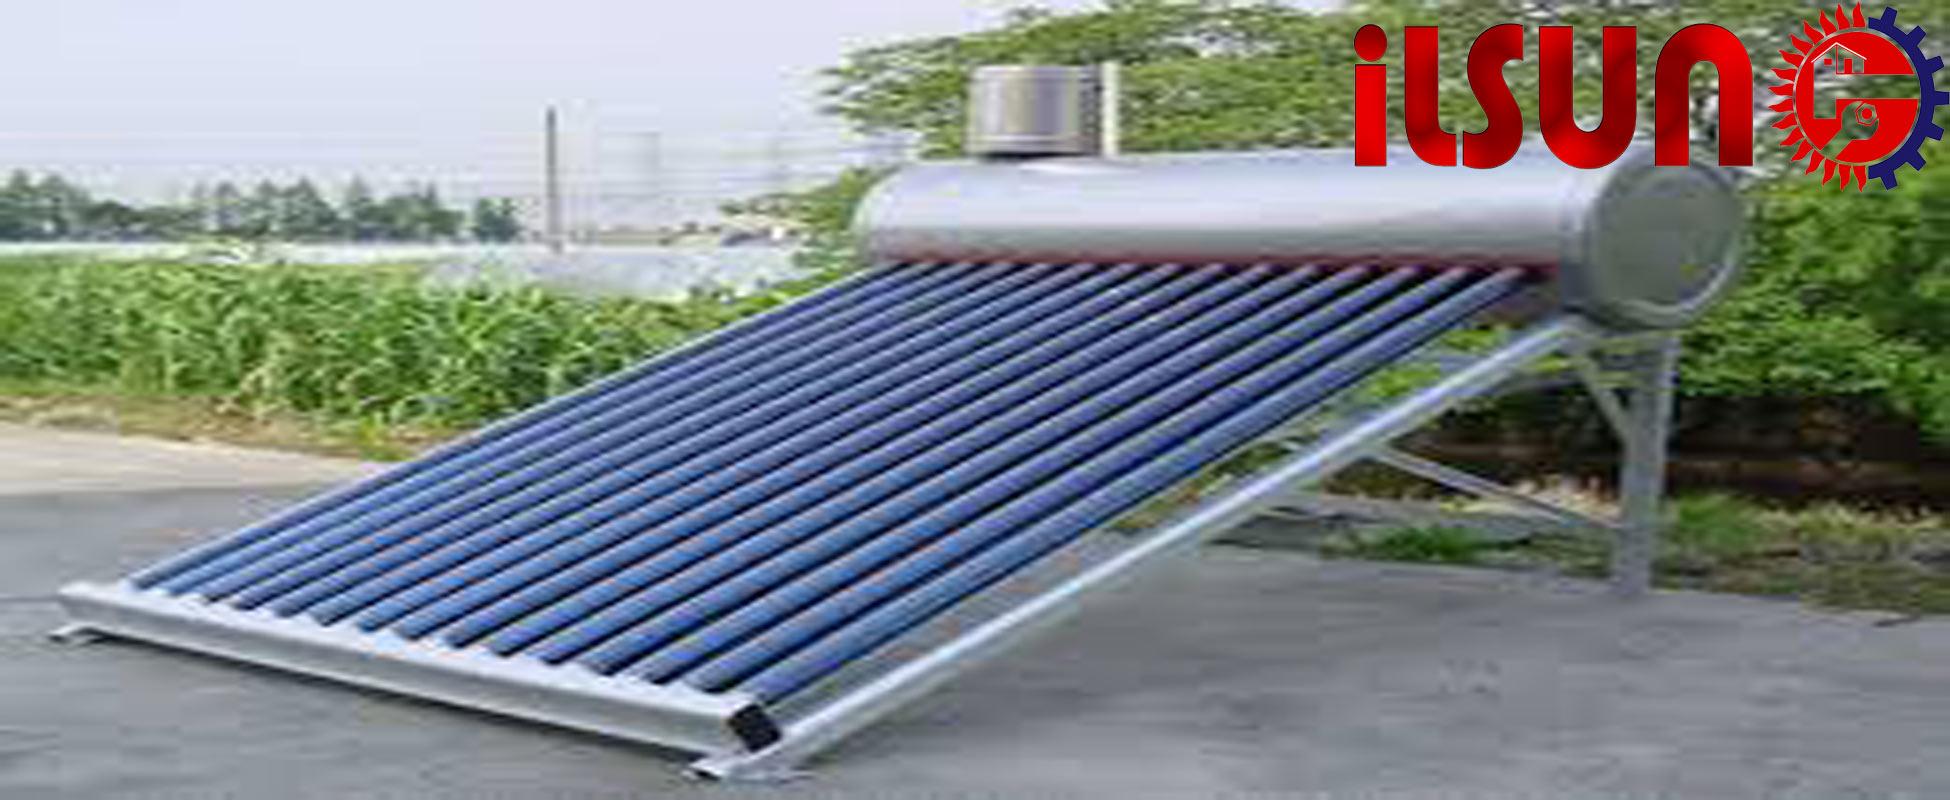 خرید آبگرمکن خورشیدی . نصب آبگرمکن خورشیدی روی زمین